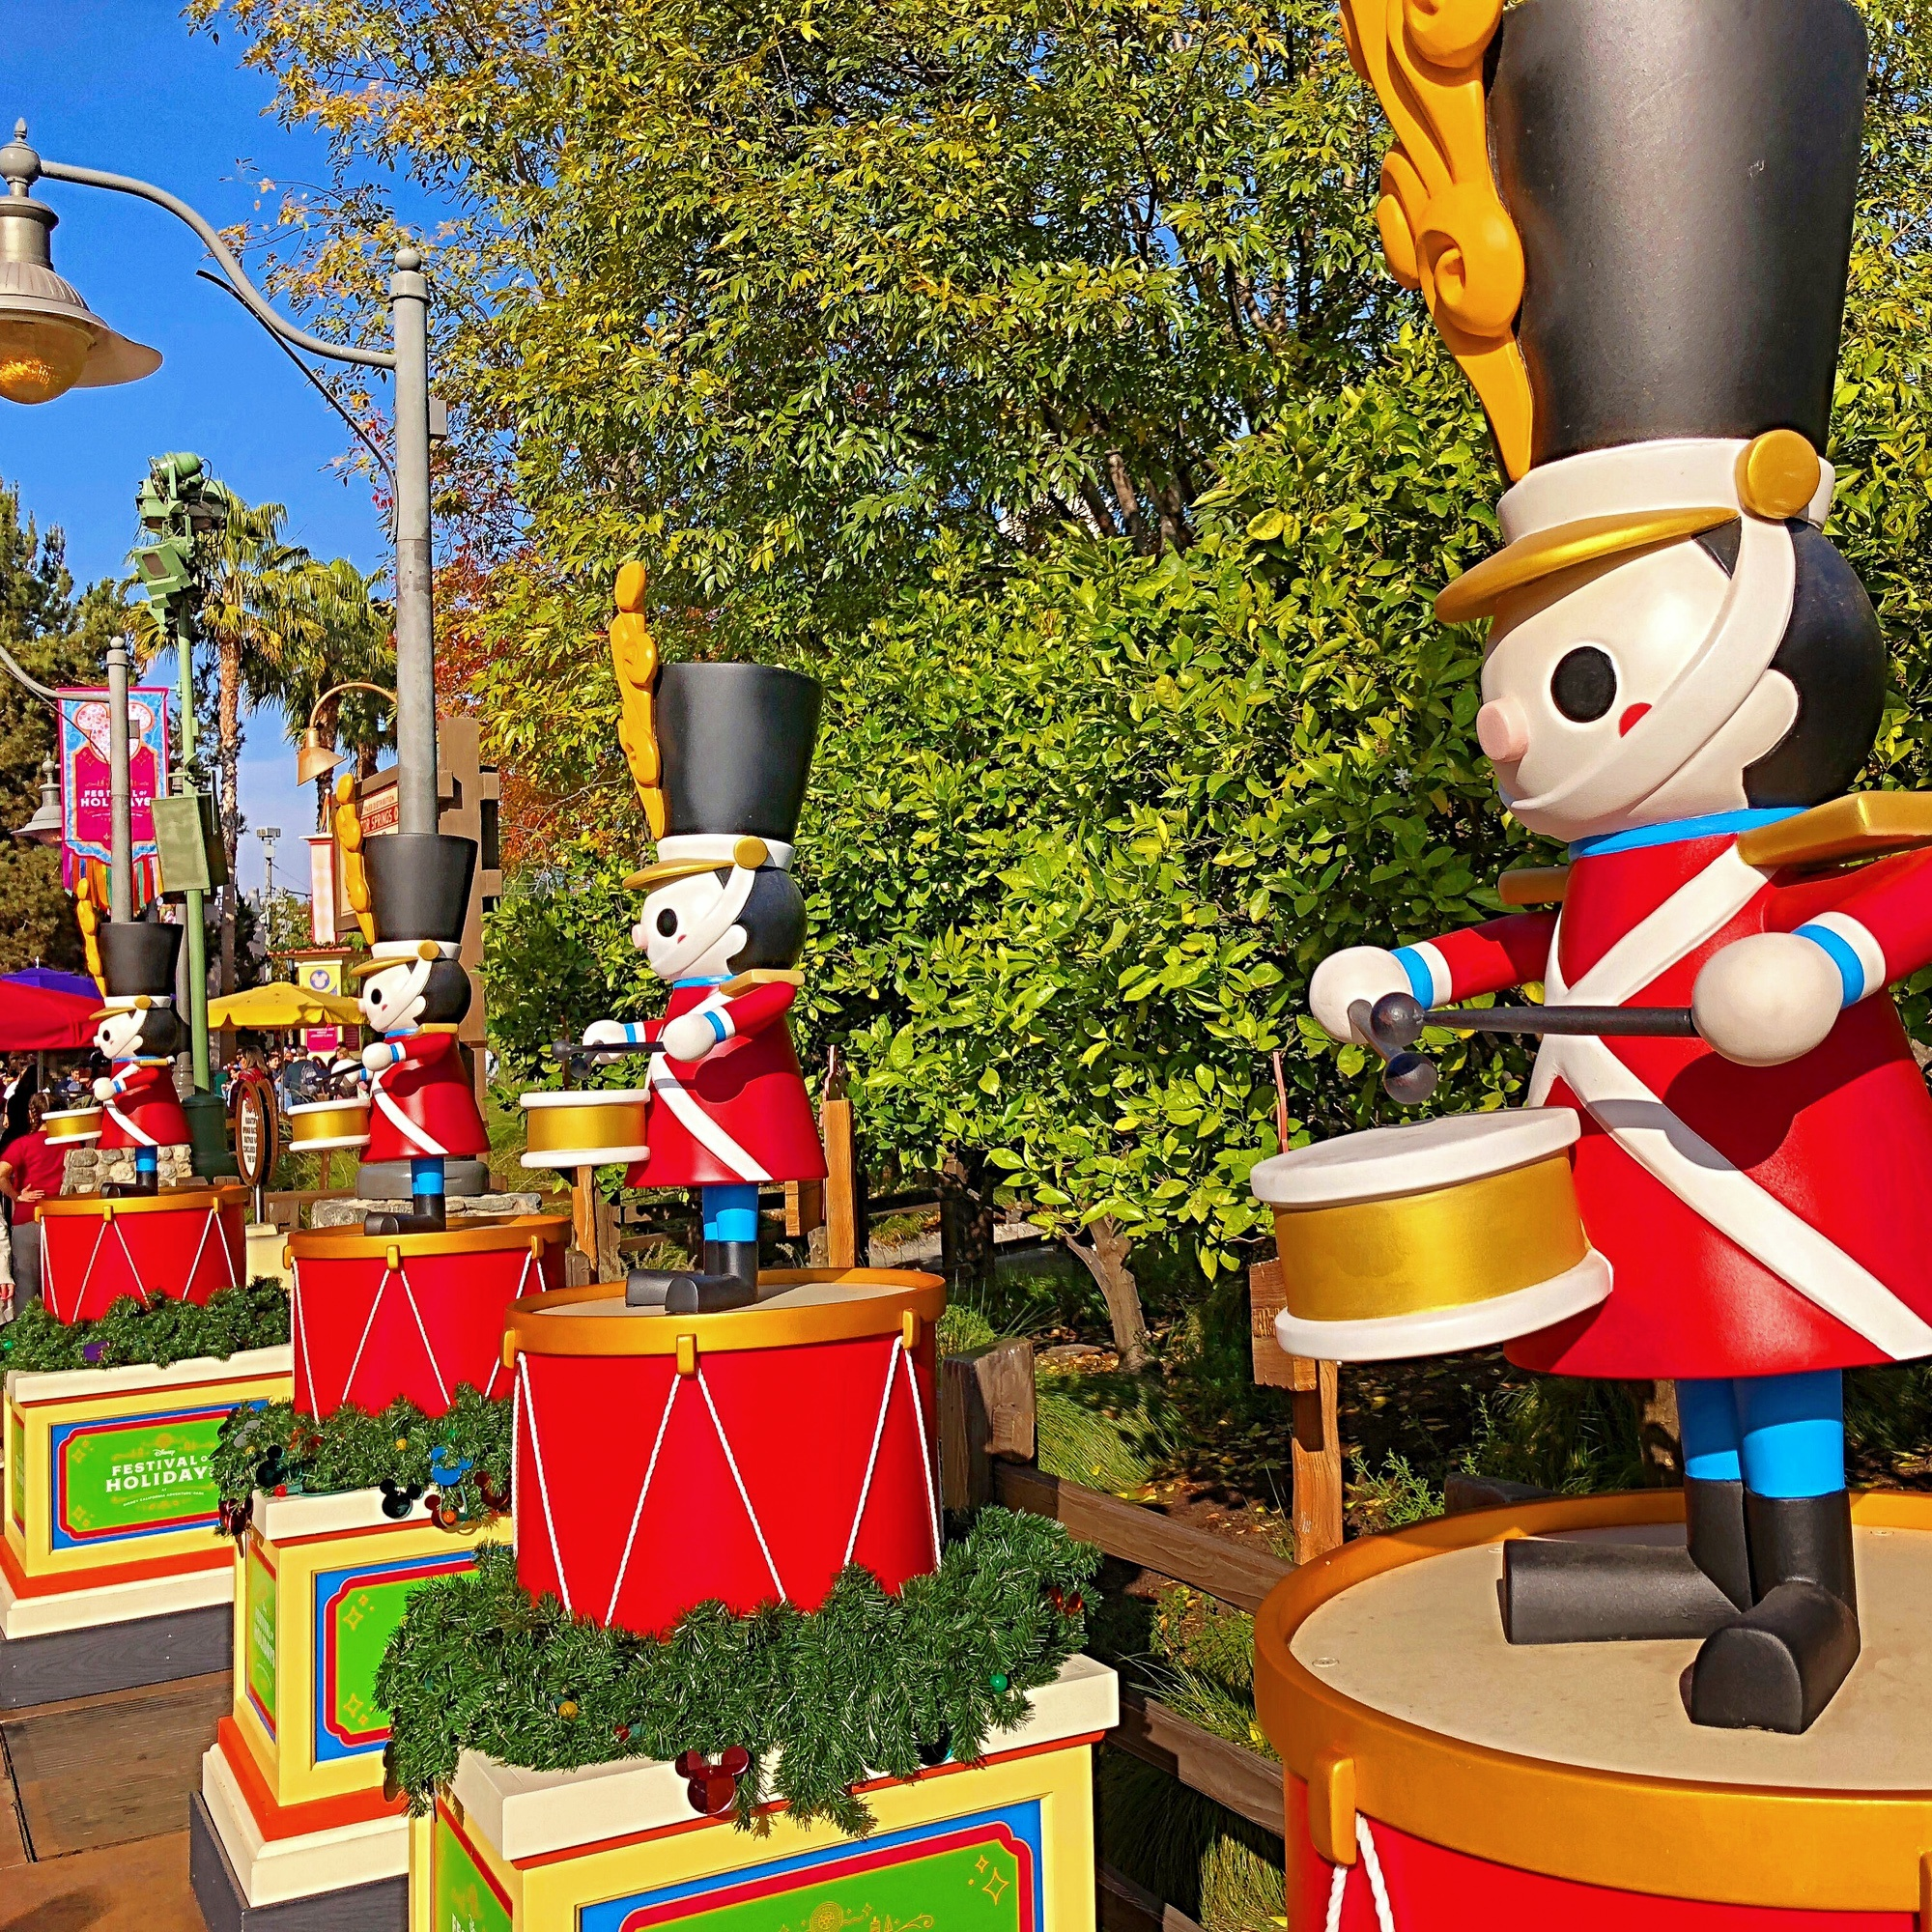 Holiday decorations at Disney California Adventure Park